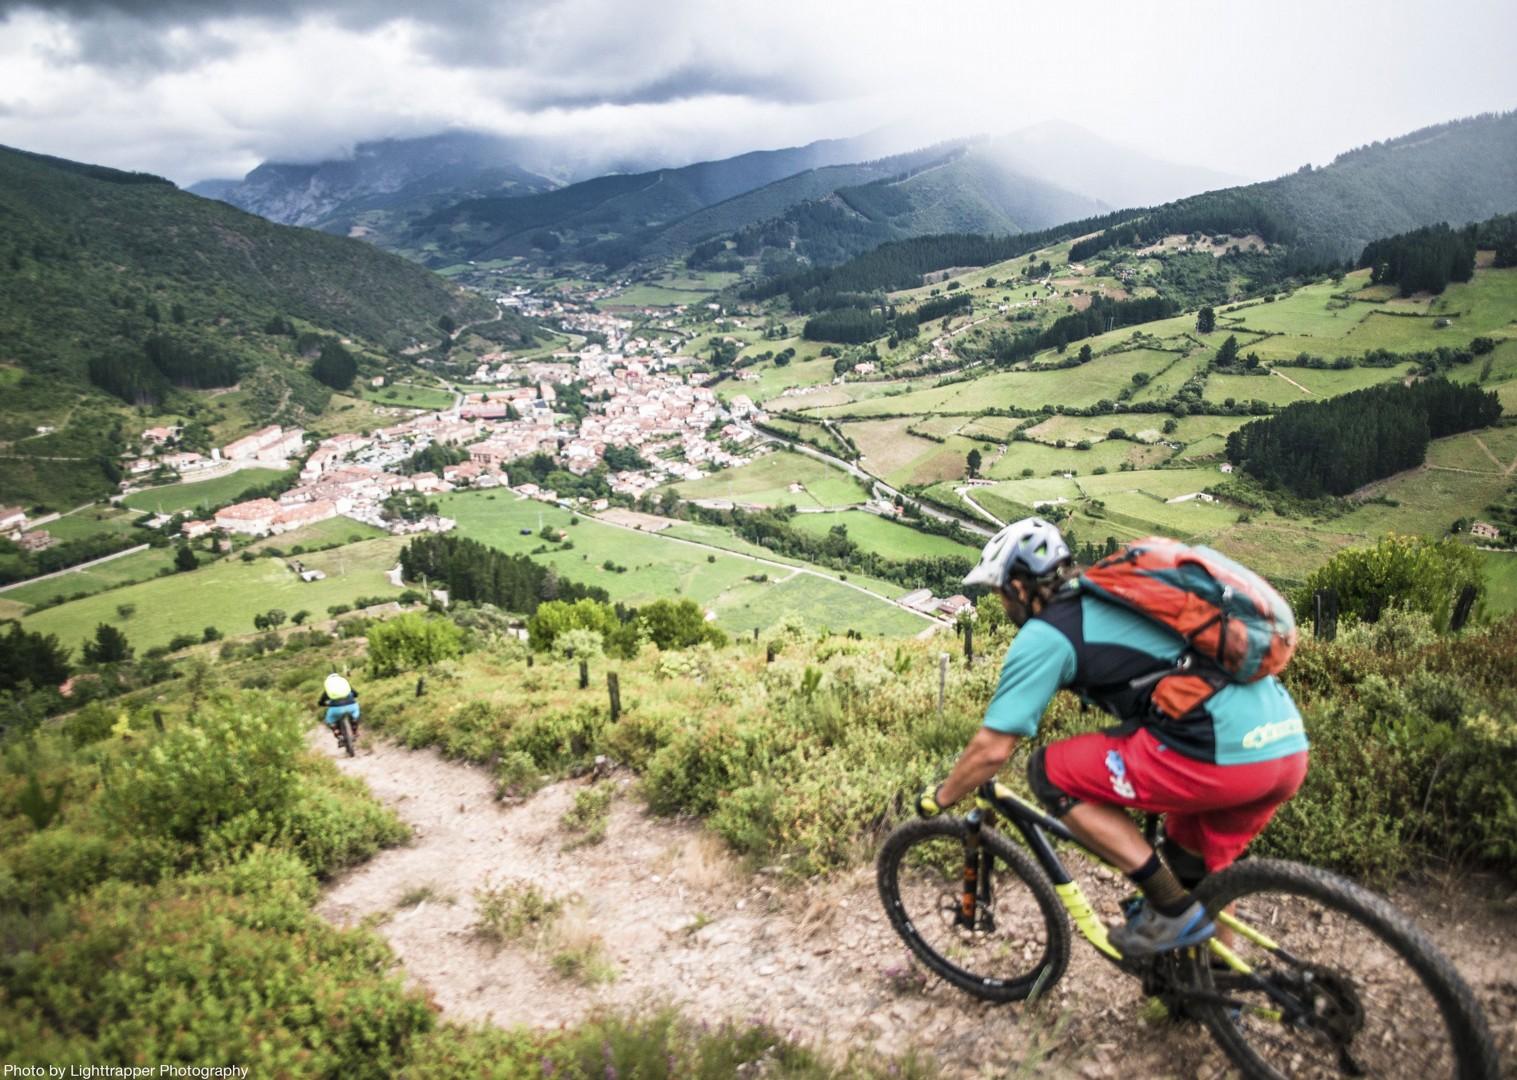 single-dirt-track-mountain-biking-picos-andara-massif.jpg - Spain - Picos de Europa - Trans Picos - Guided Mountain Bike Holiday - Mountain Biking